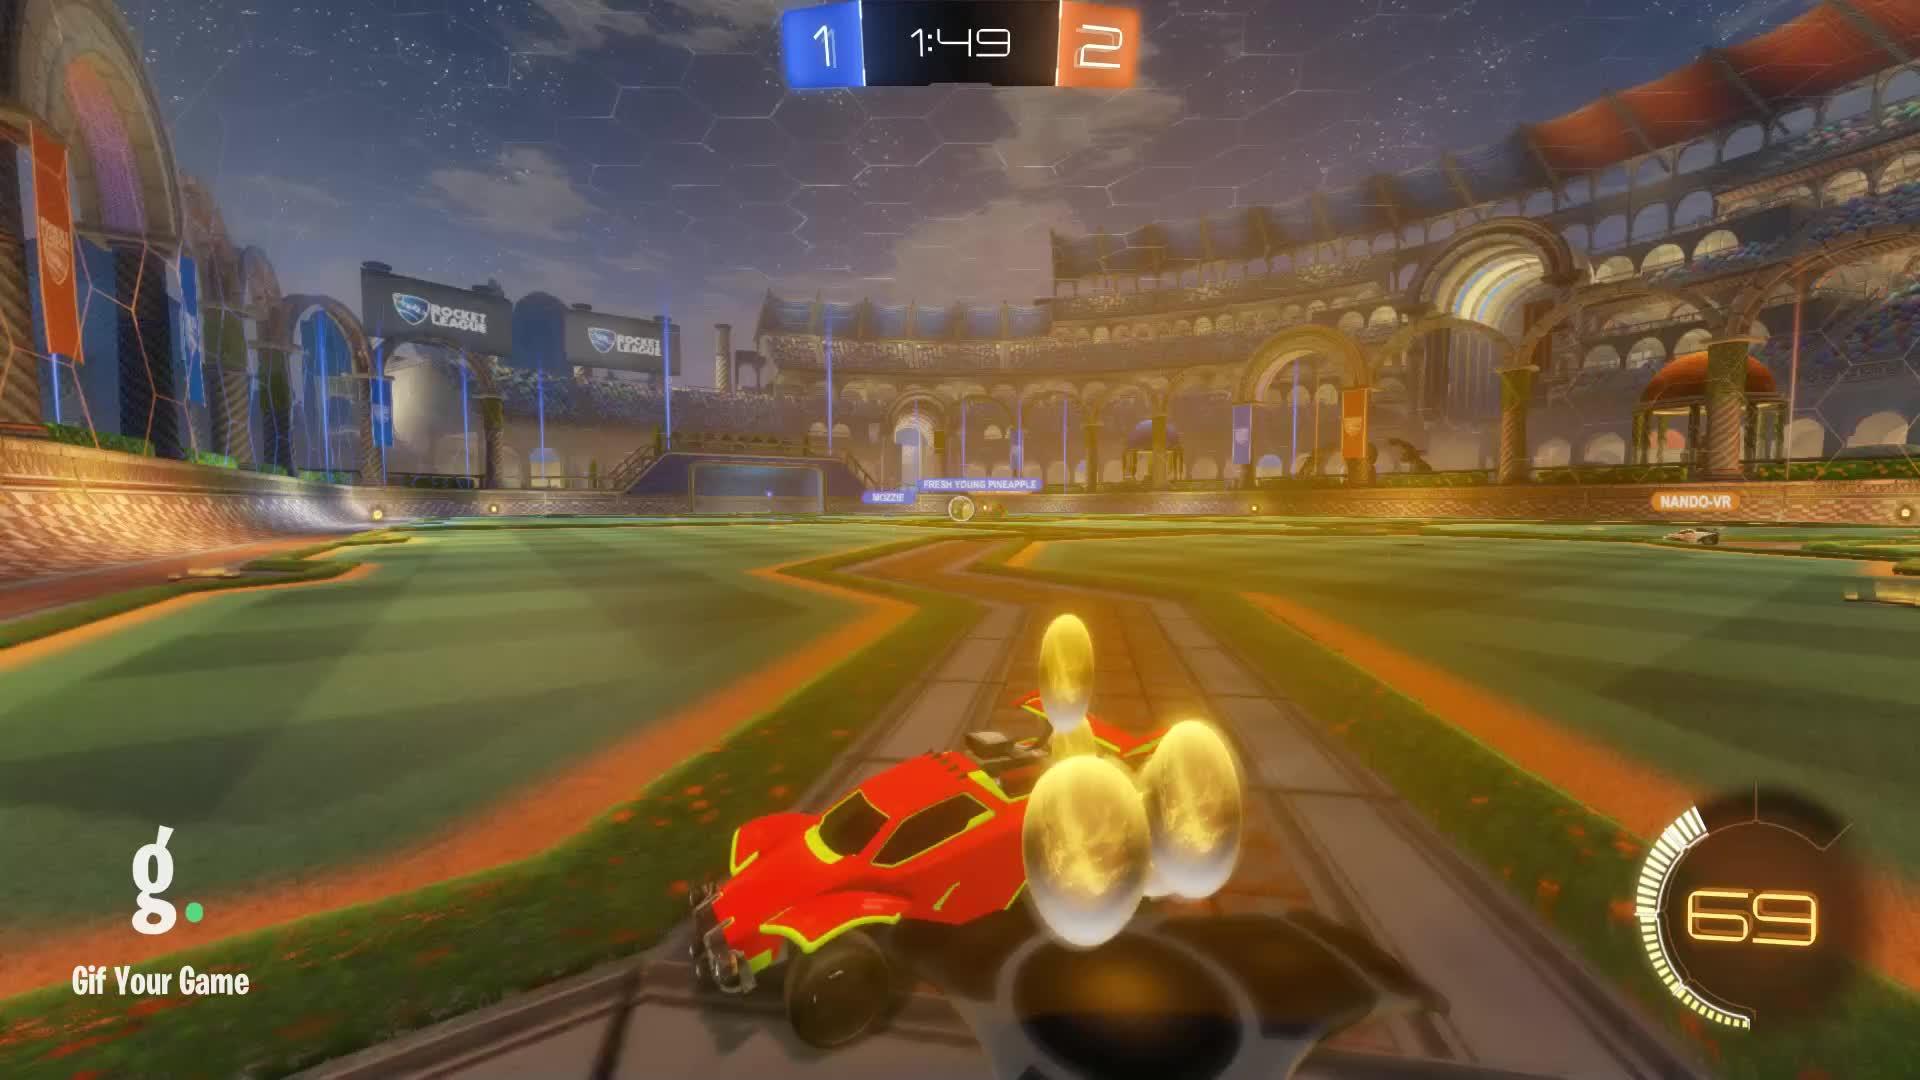 Gif Your Game, GifYourGame, Goal, Rashman, Rocket League, RocketLeague, Goal 4: Rashman GIFs